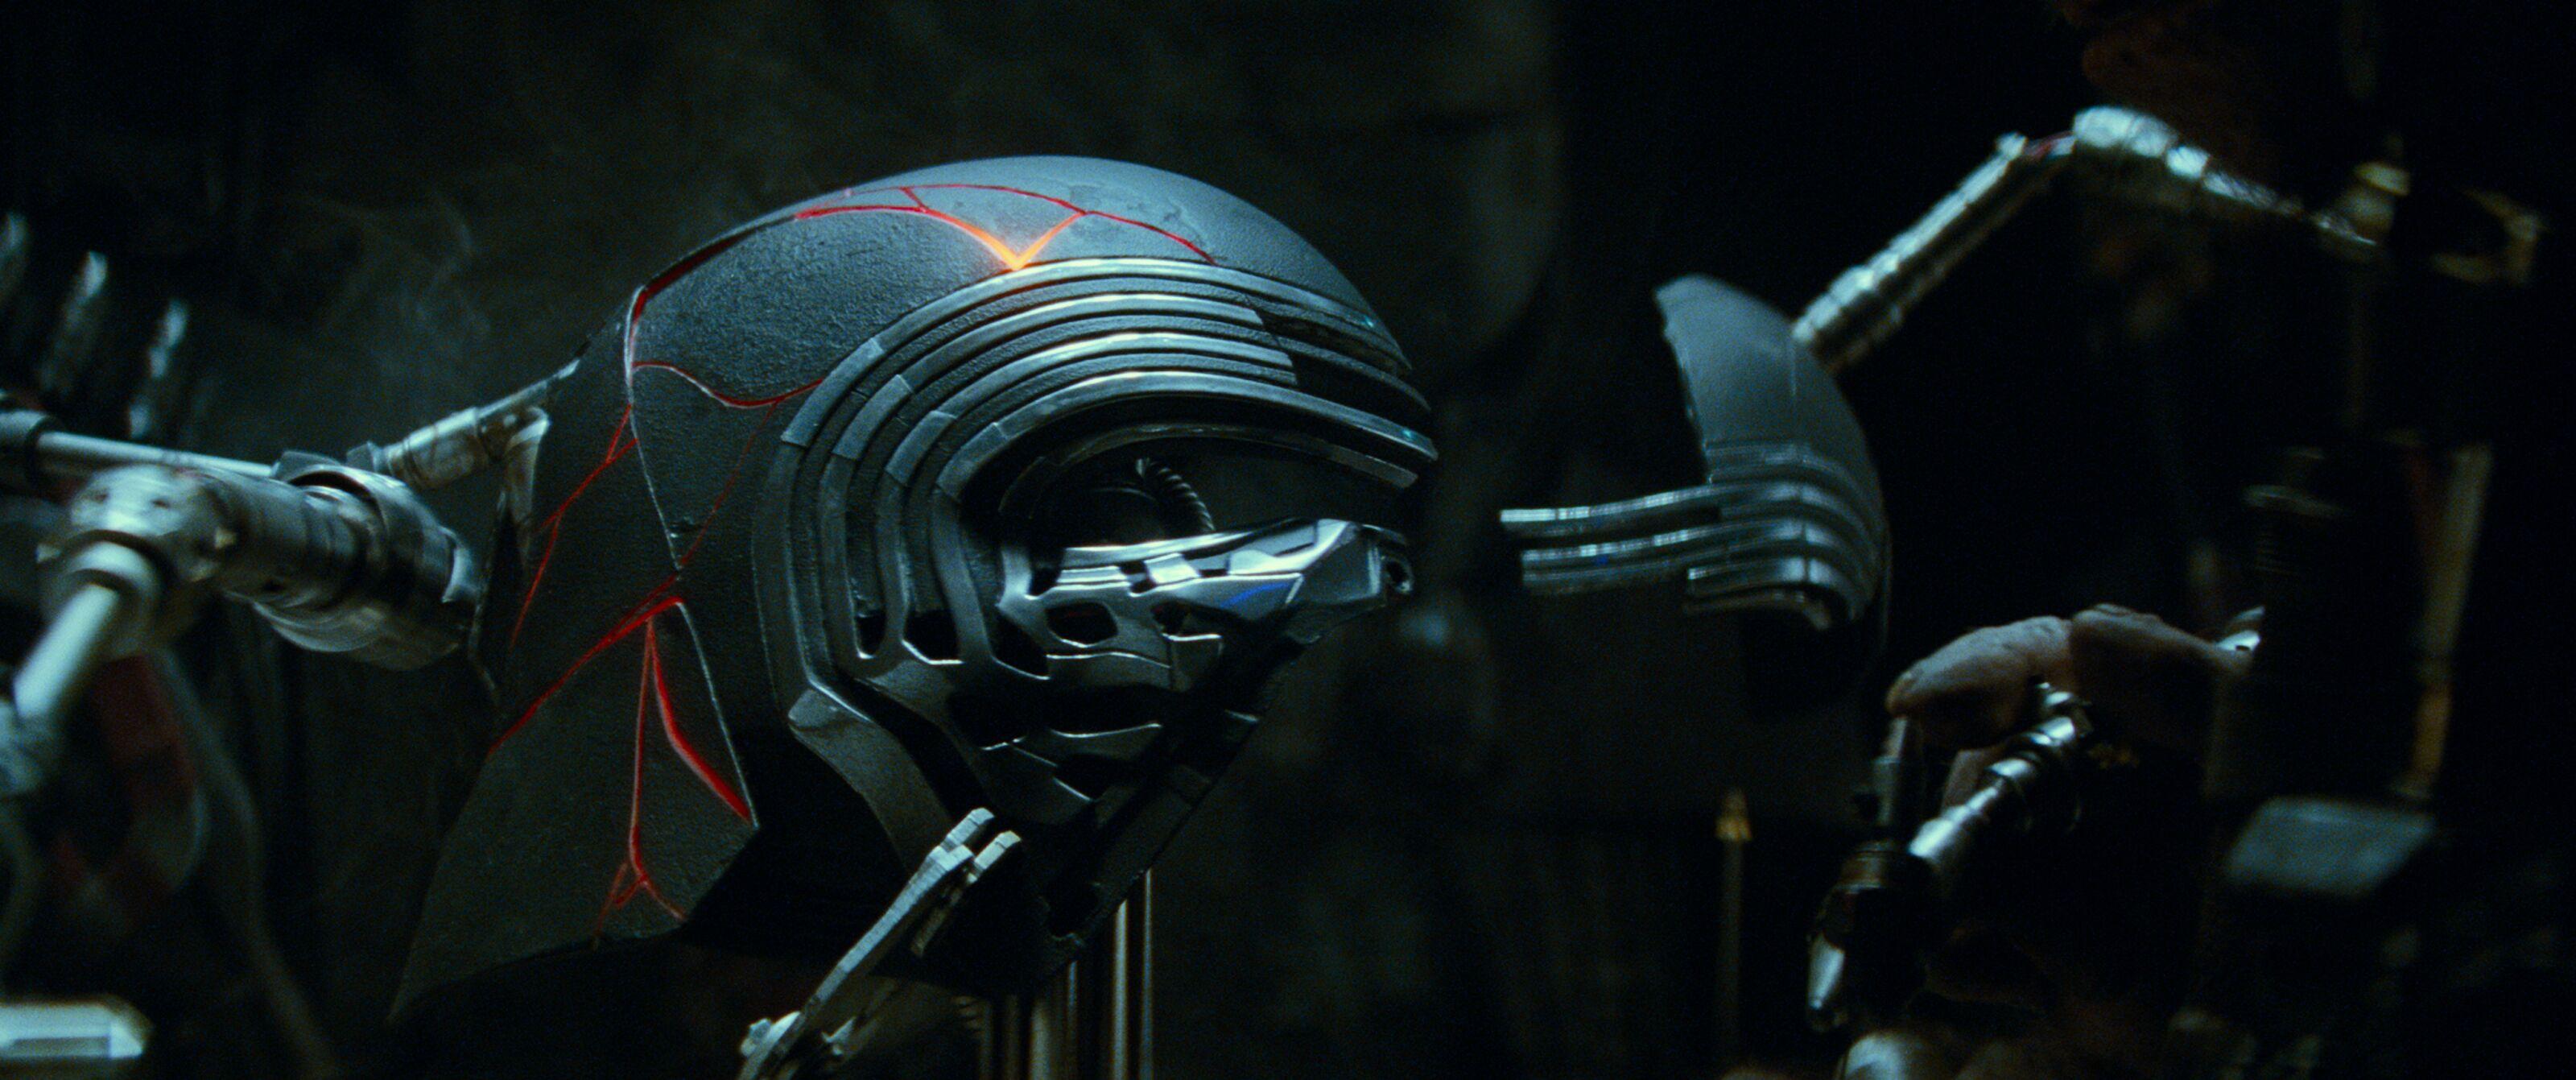 Star Wars: The Rise of Skywalker TV spot has hidden Darth Vader Easter egg